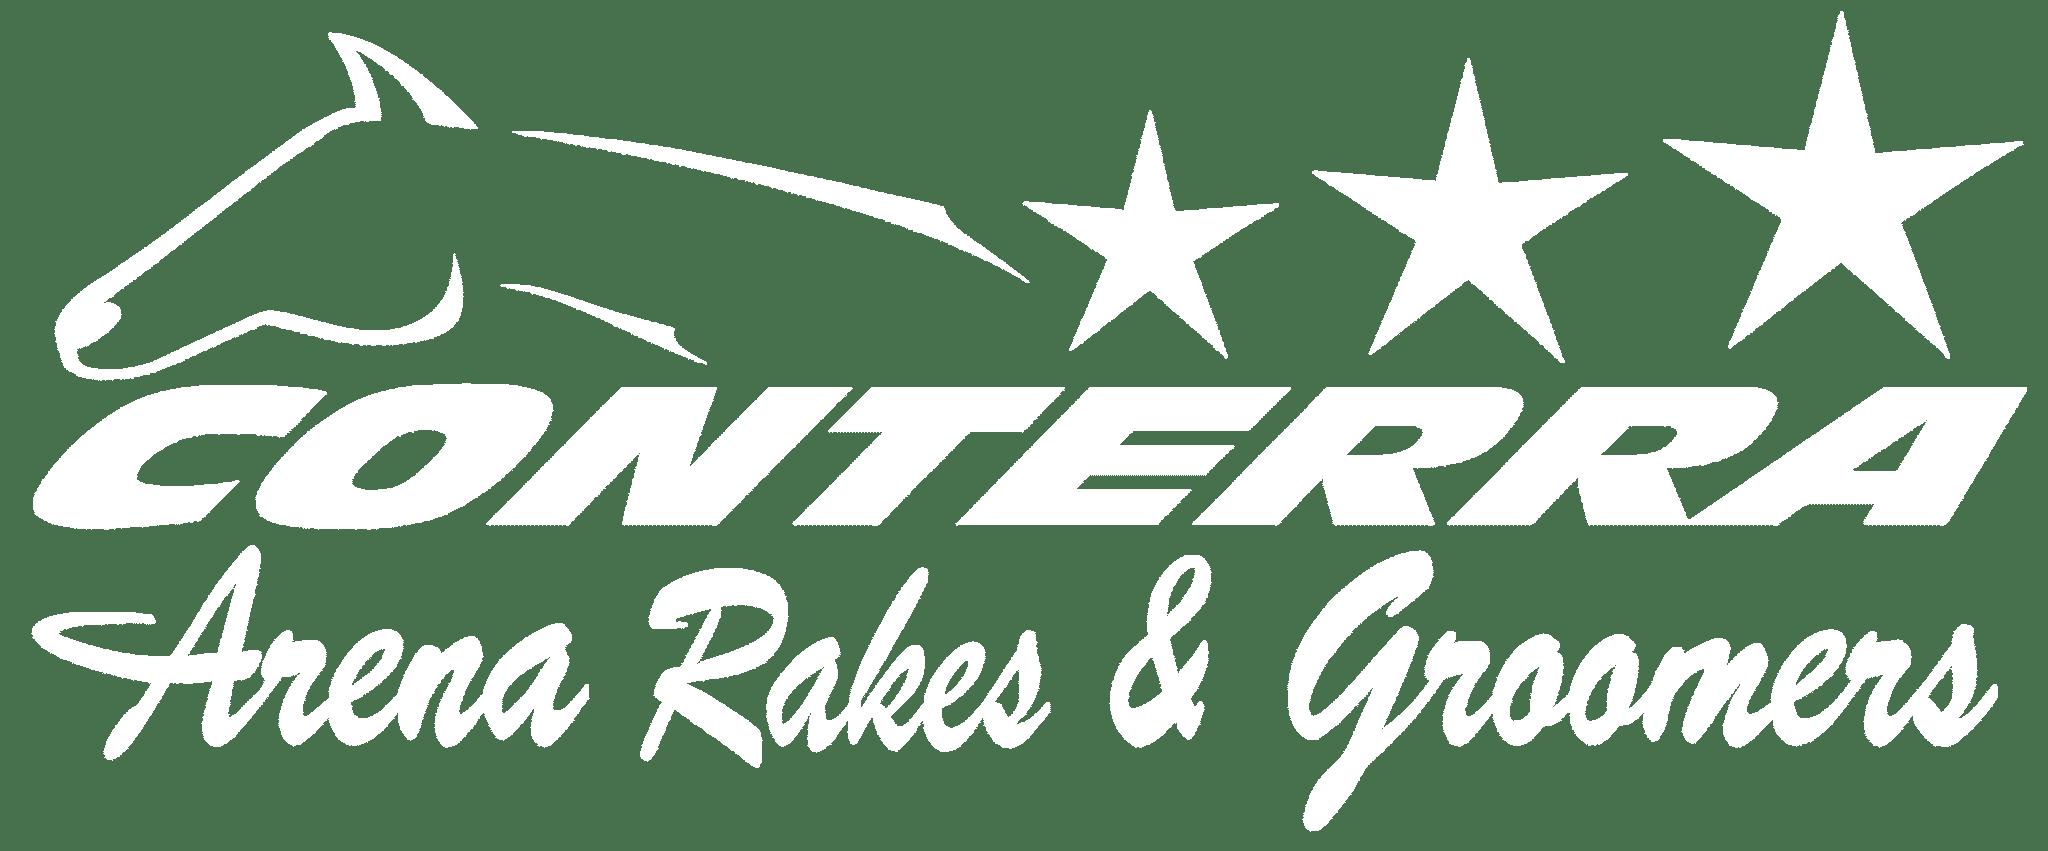 Arena Rakes Groomers W2